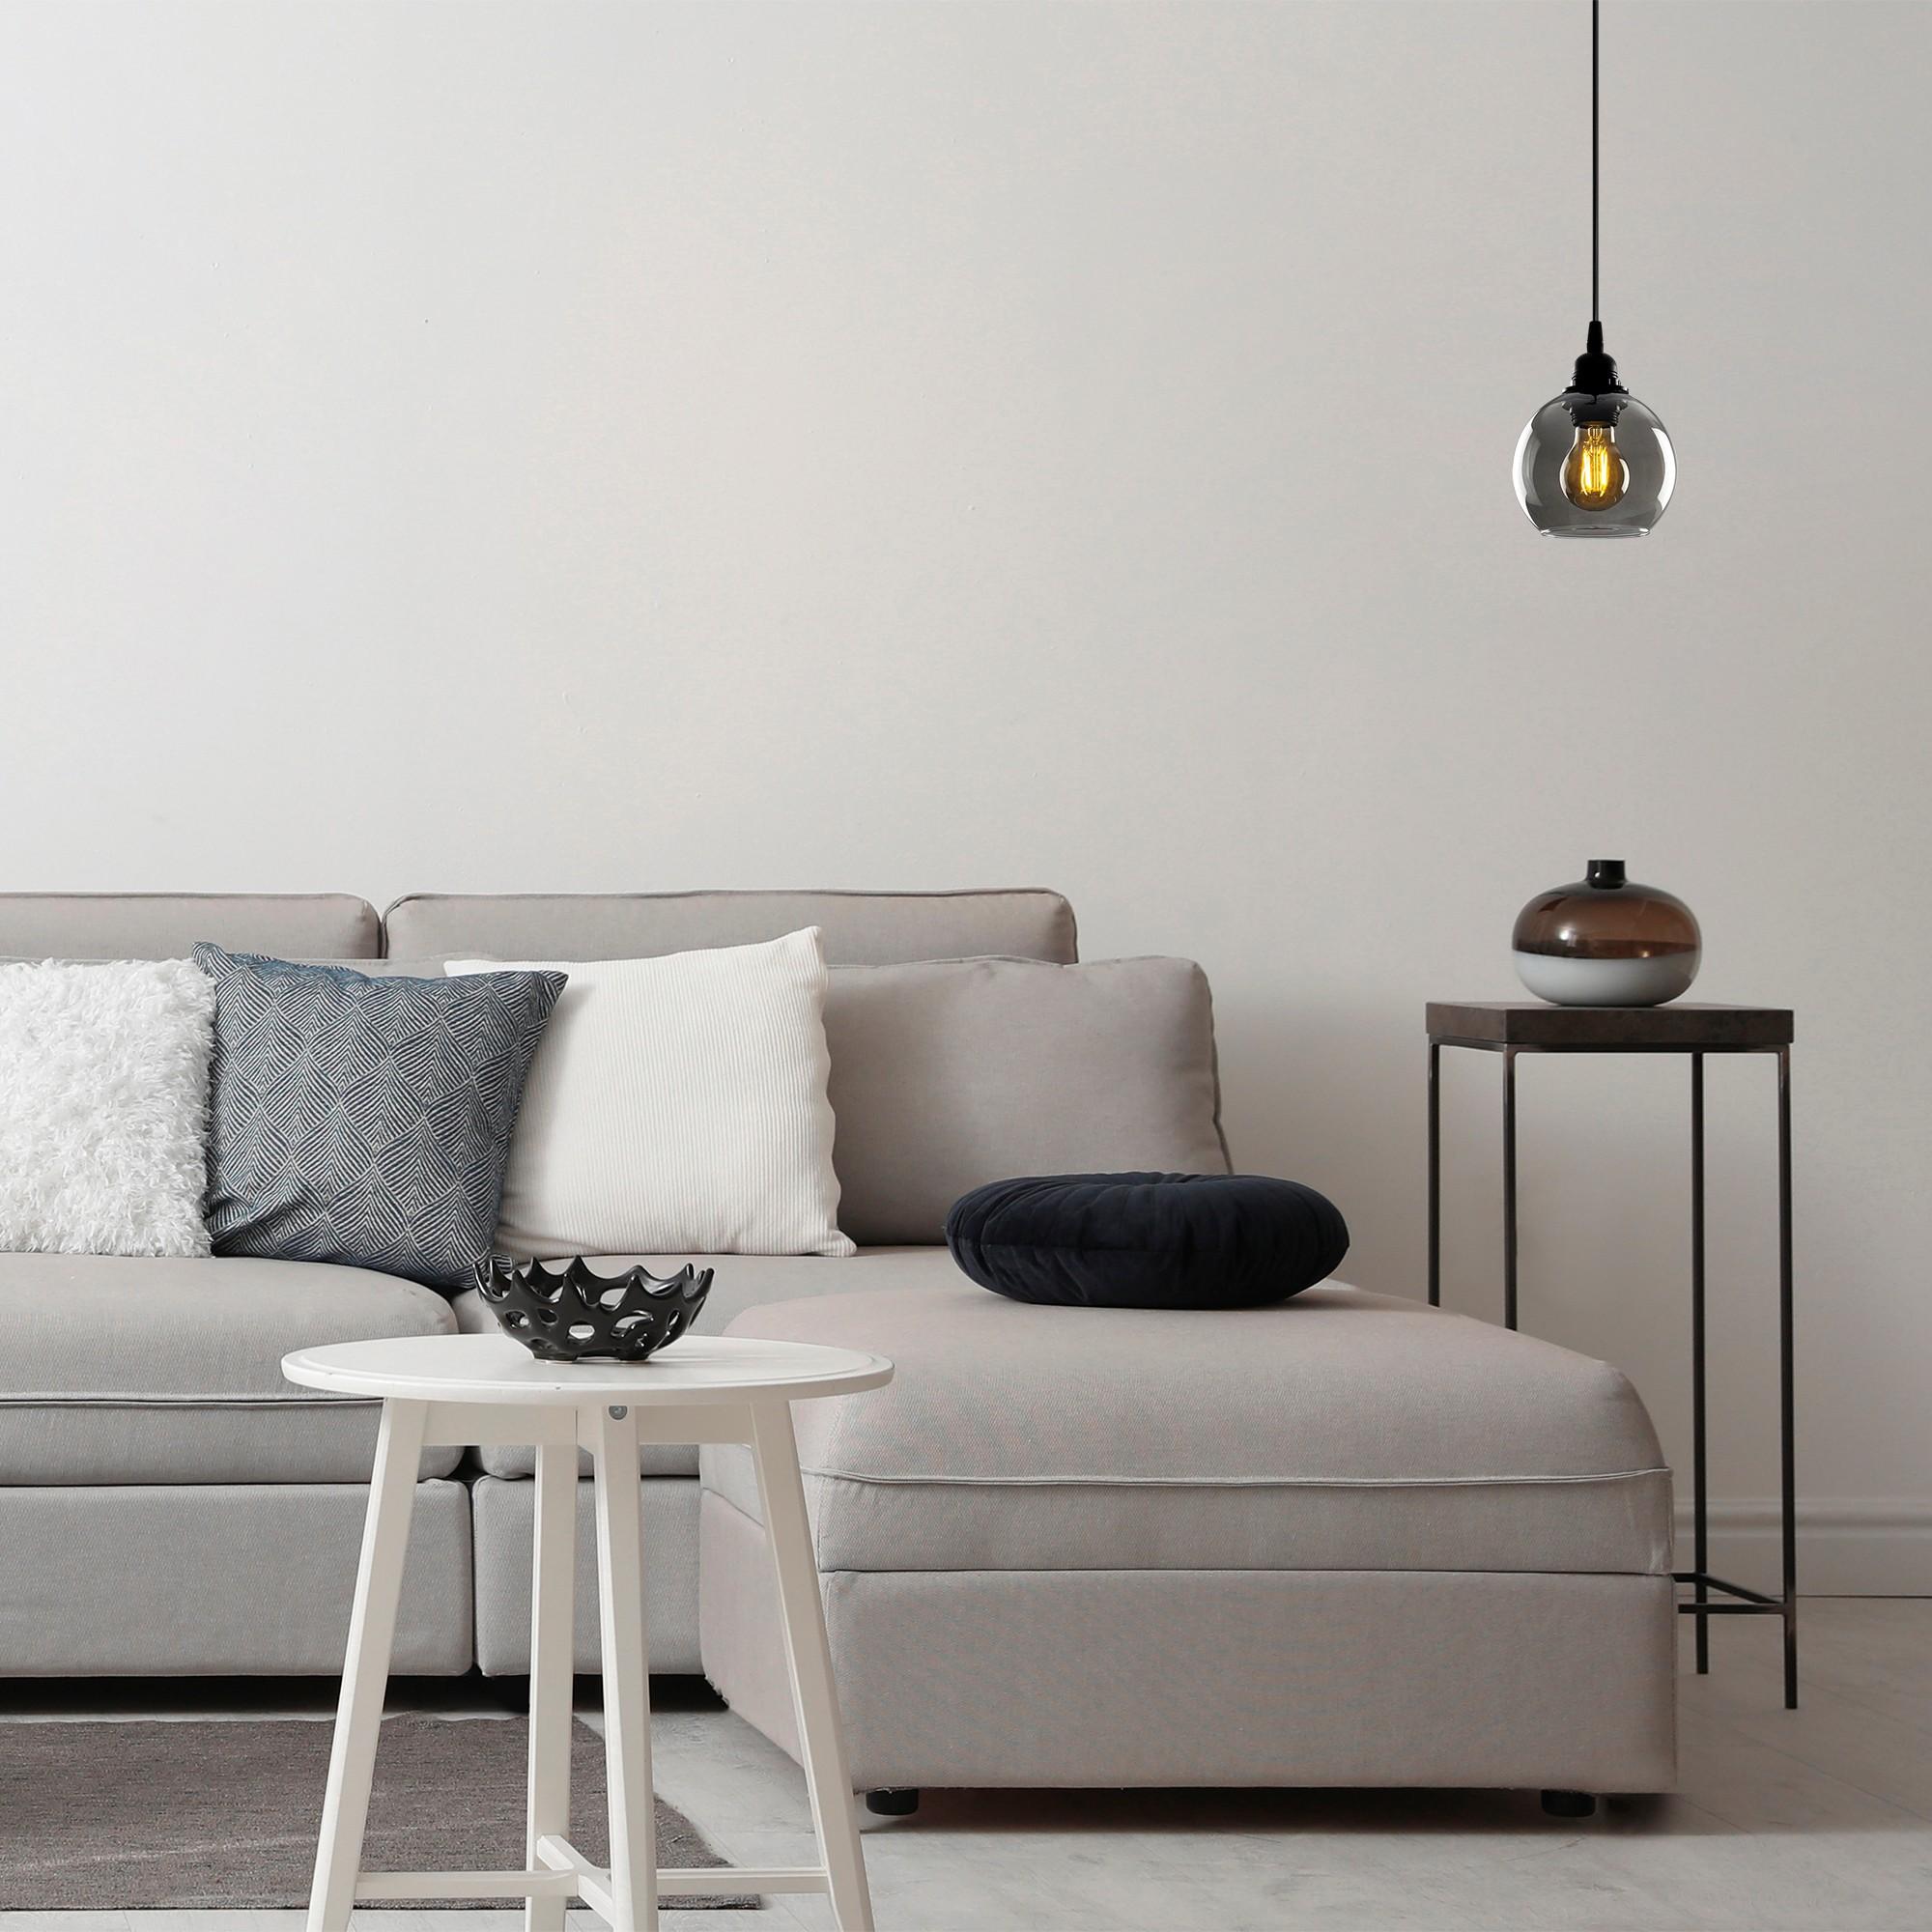 Hanglamp gerookt glas zwart 1 x E27 fitting - inrichting